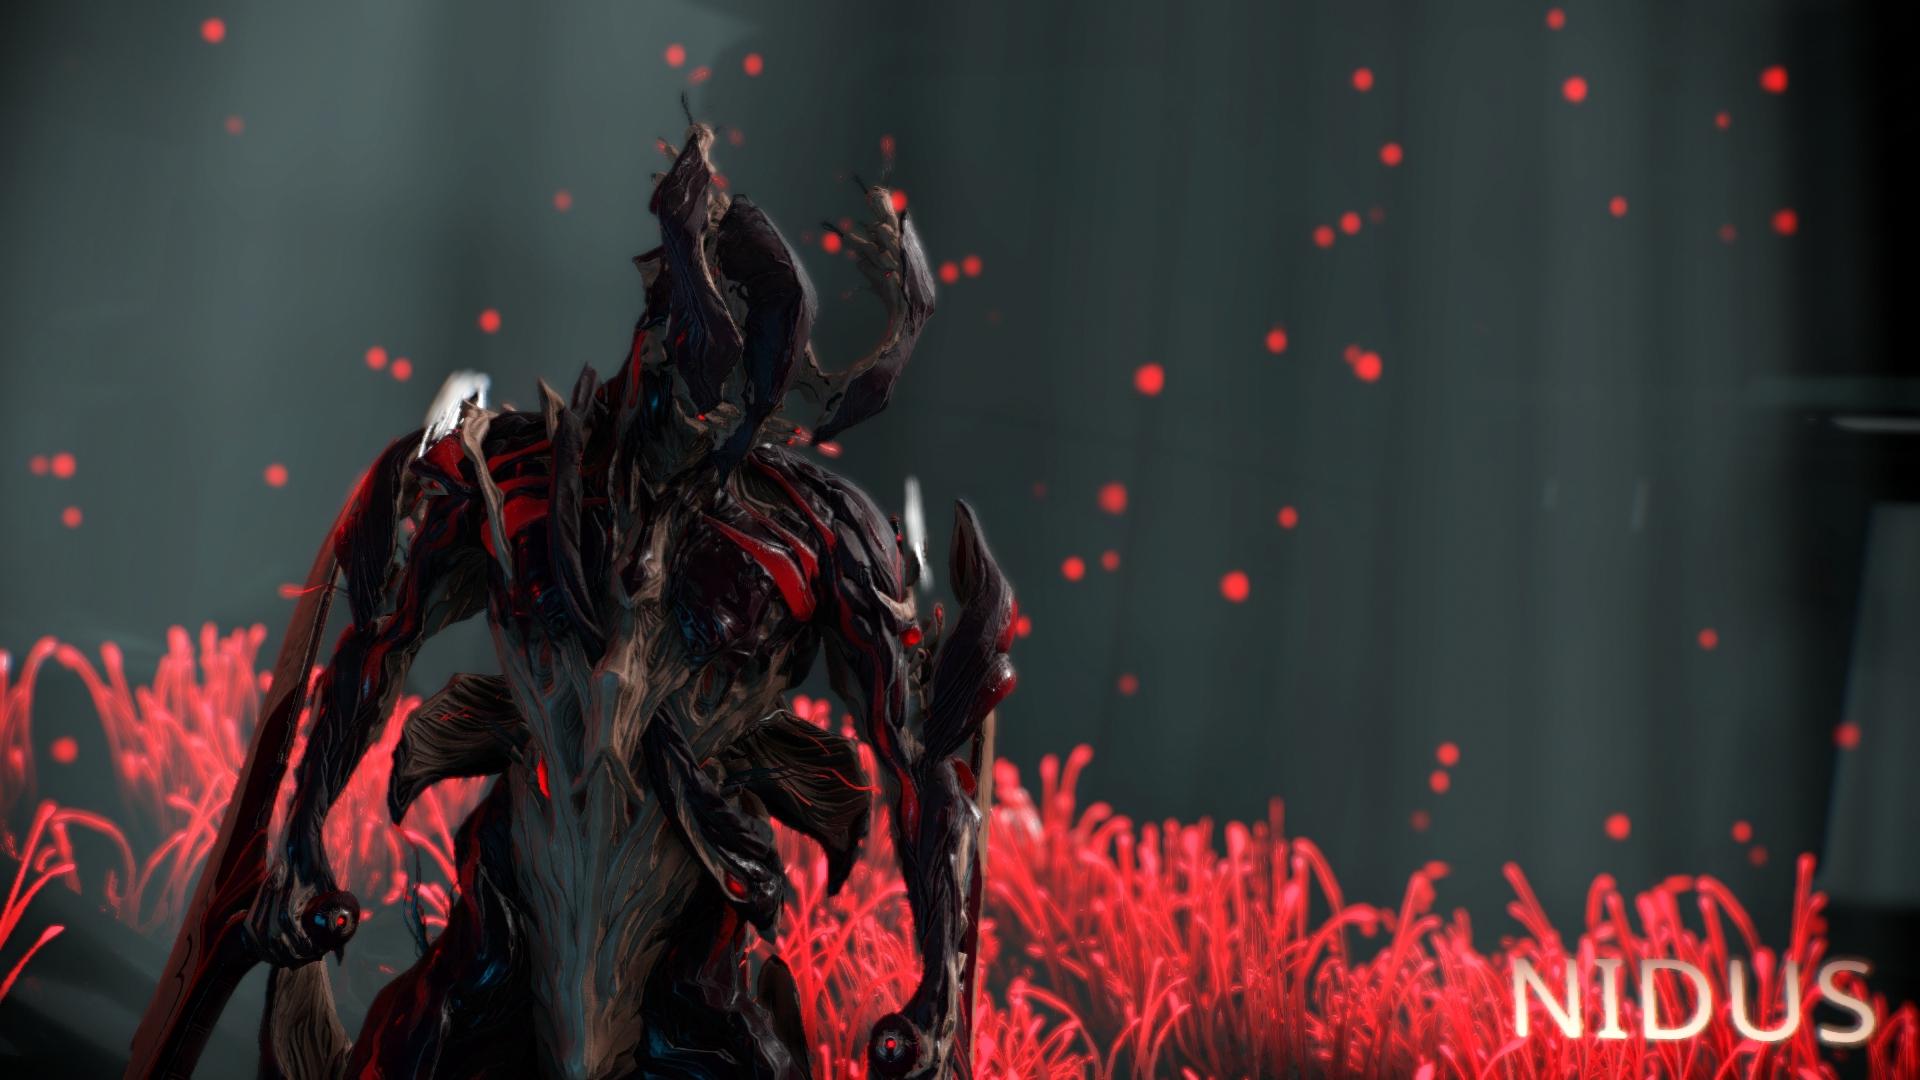 Nidus Captura TYRANIDus From The Grim Darkness Of The 41st Millenium WarframeRunway